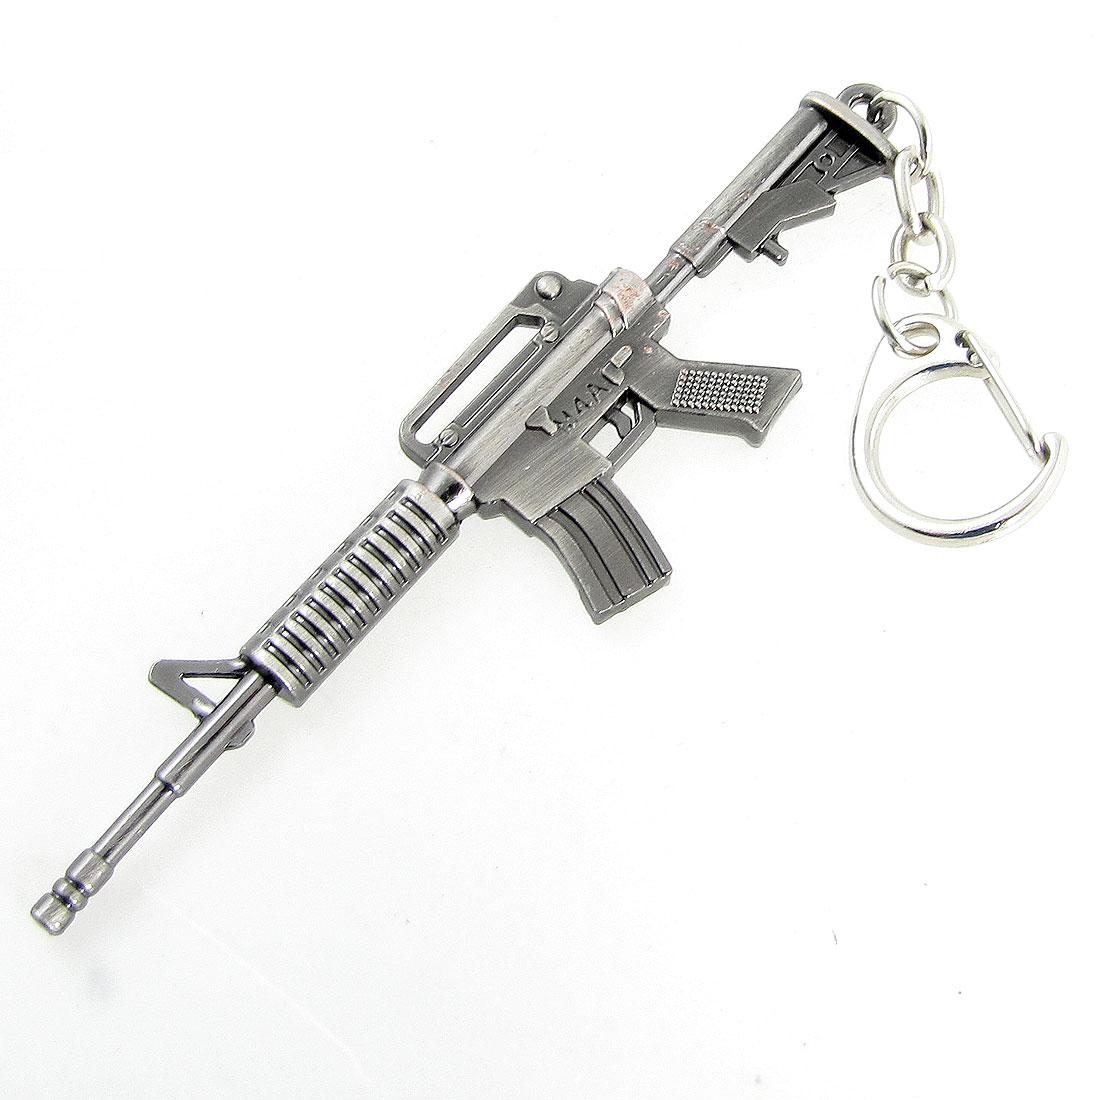 Miniature Gray Metal M4A1 Assault Rifle Model Keychain Bag Pendant